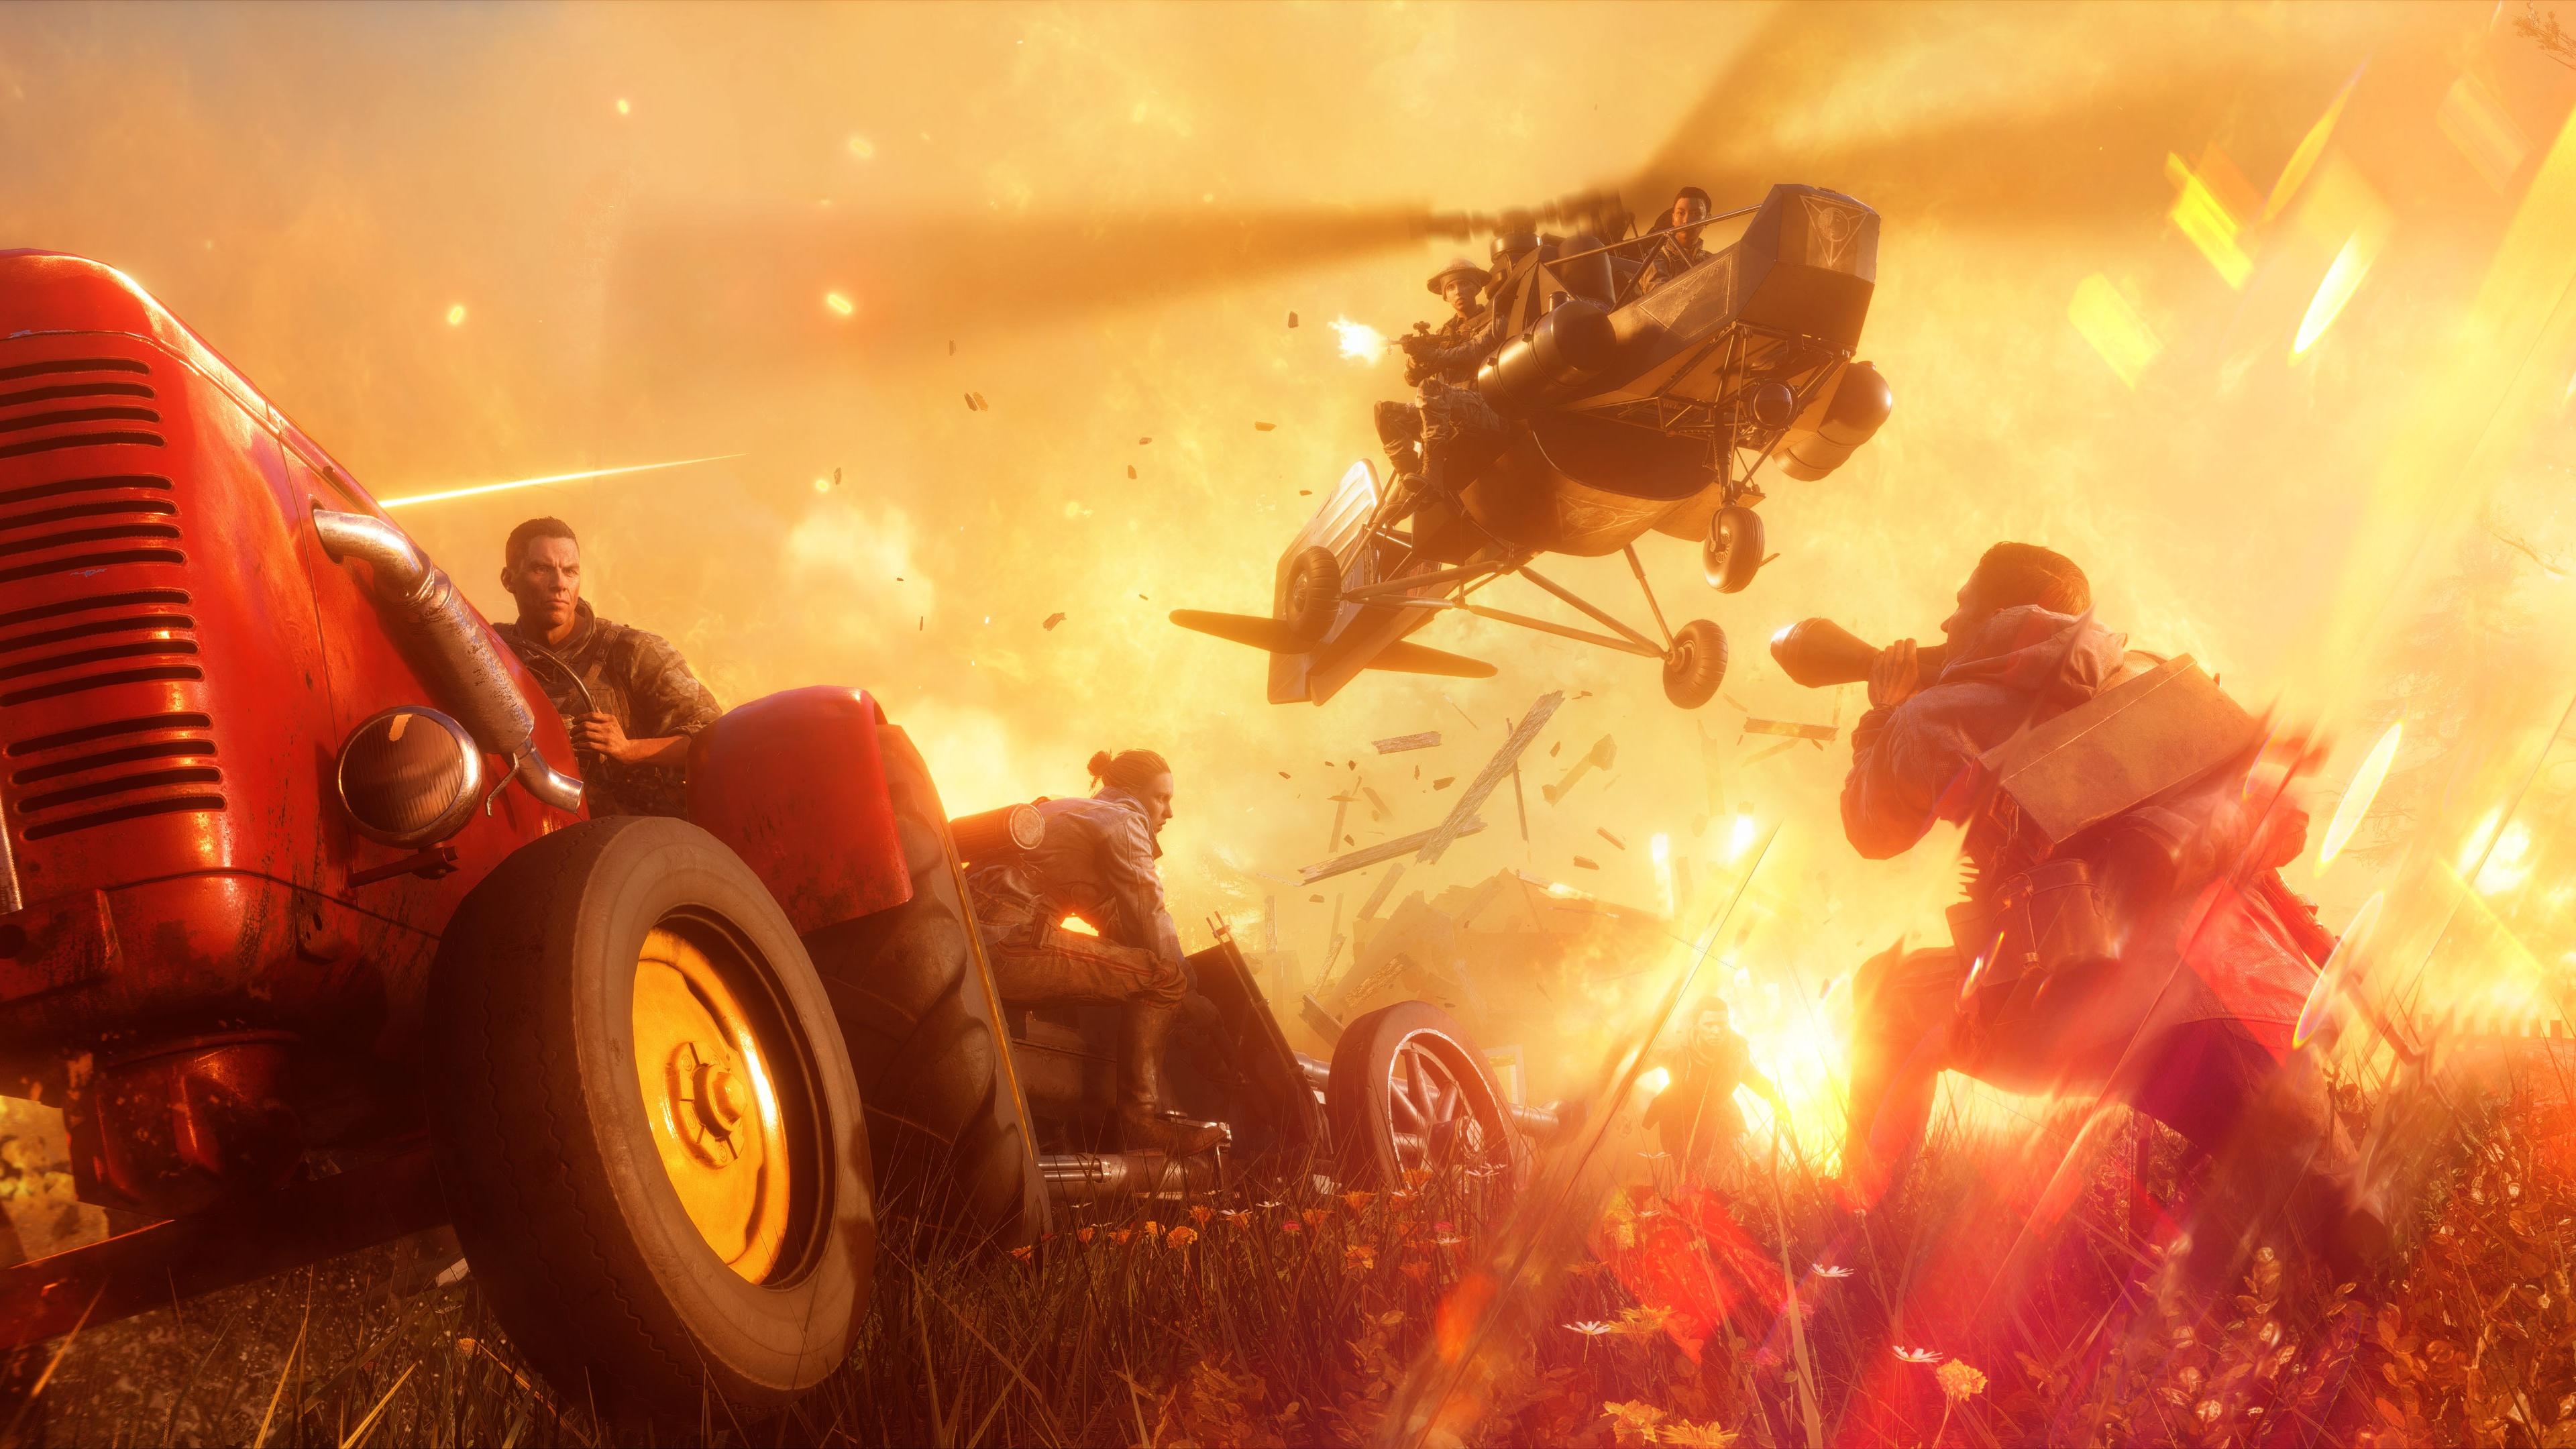 los-duos-llegan-en-el-modo-firestorm-de-battlefield-v-frikigamers.com